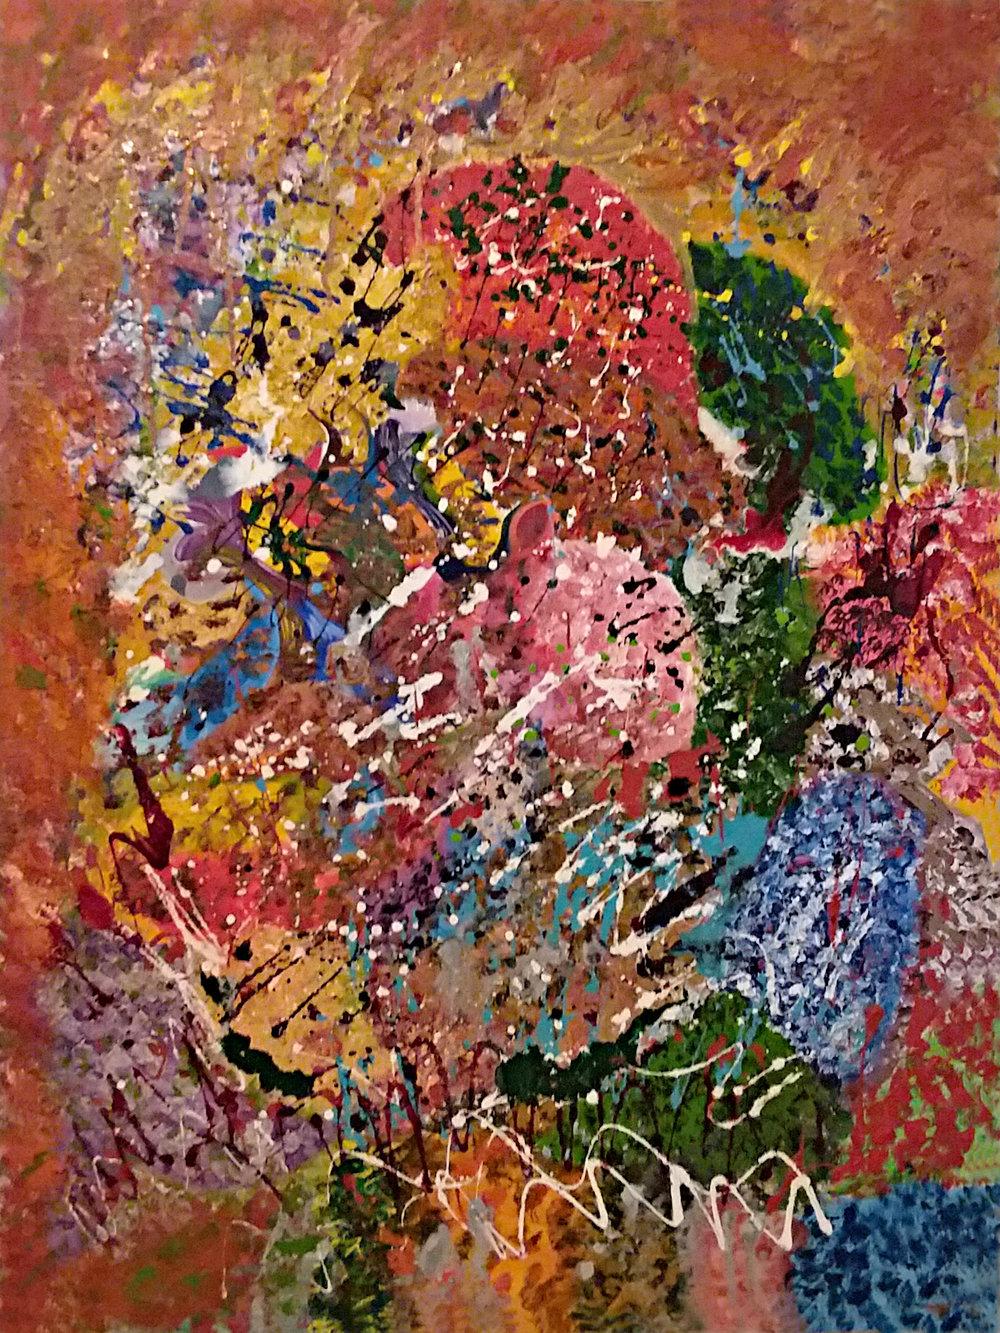 Mardi Gras Oil and Enamel on Canvas 30x40 - (05/2018) $1200